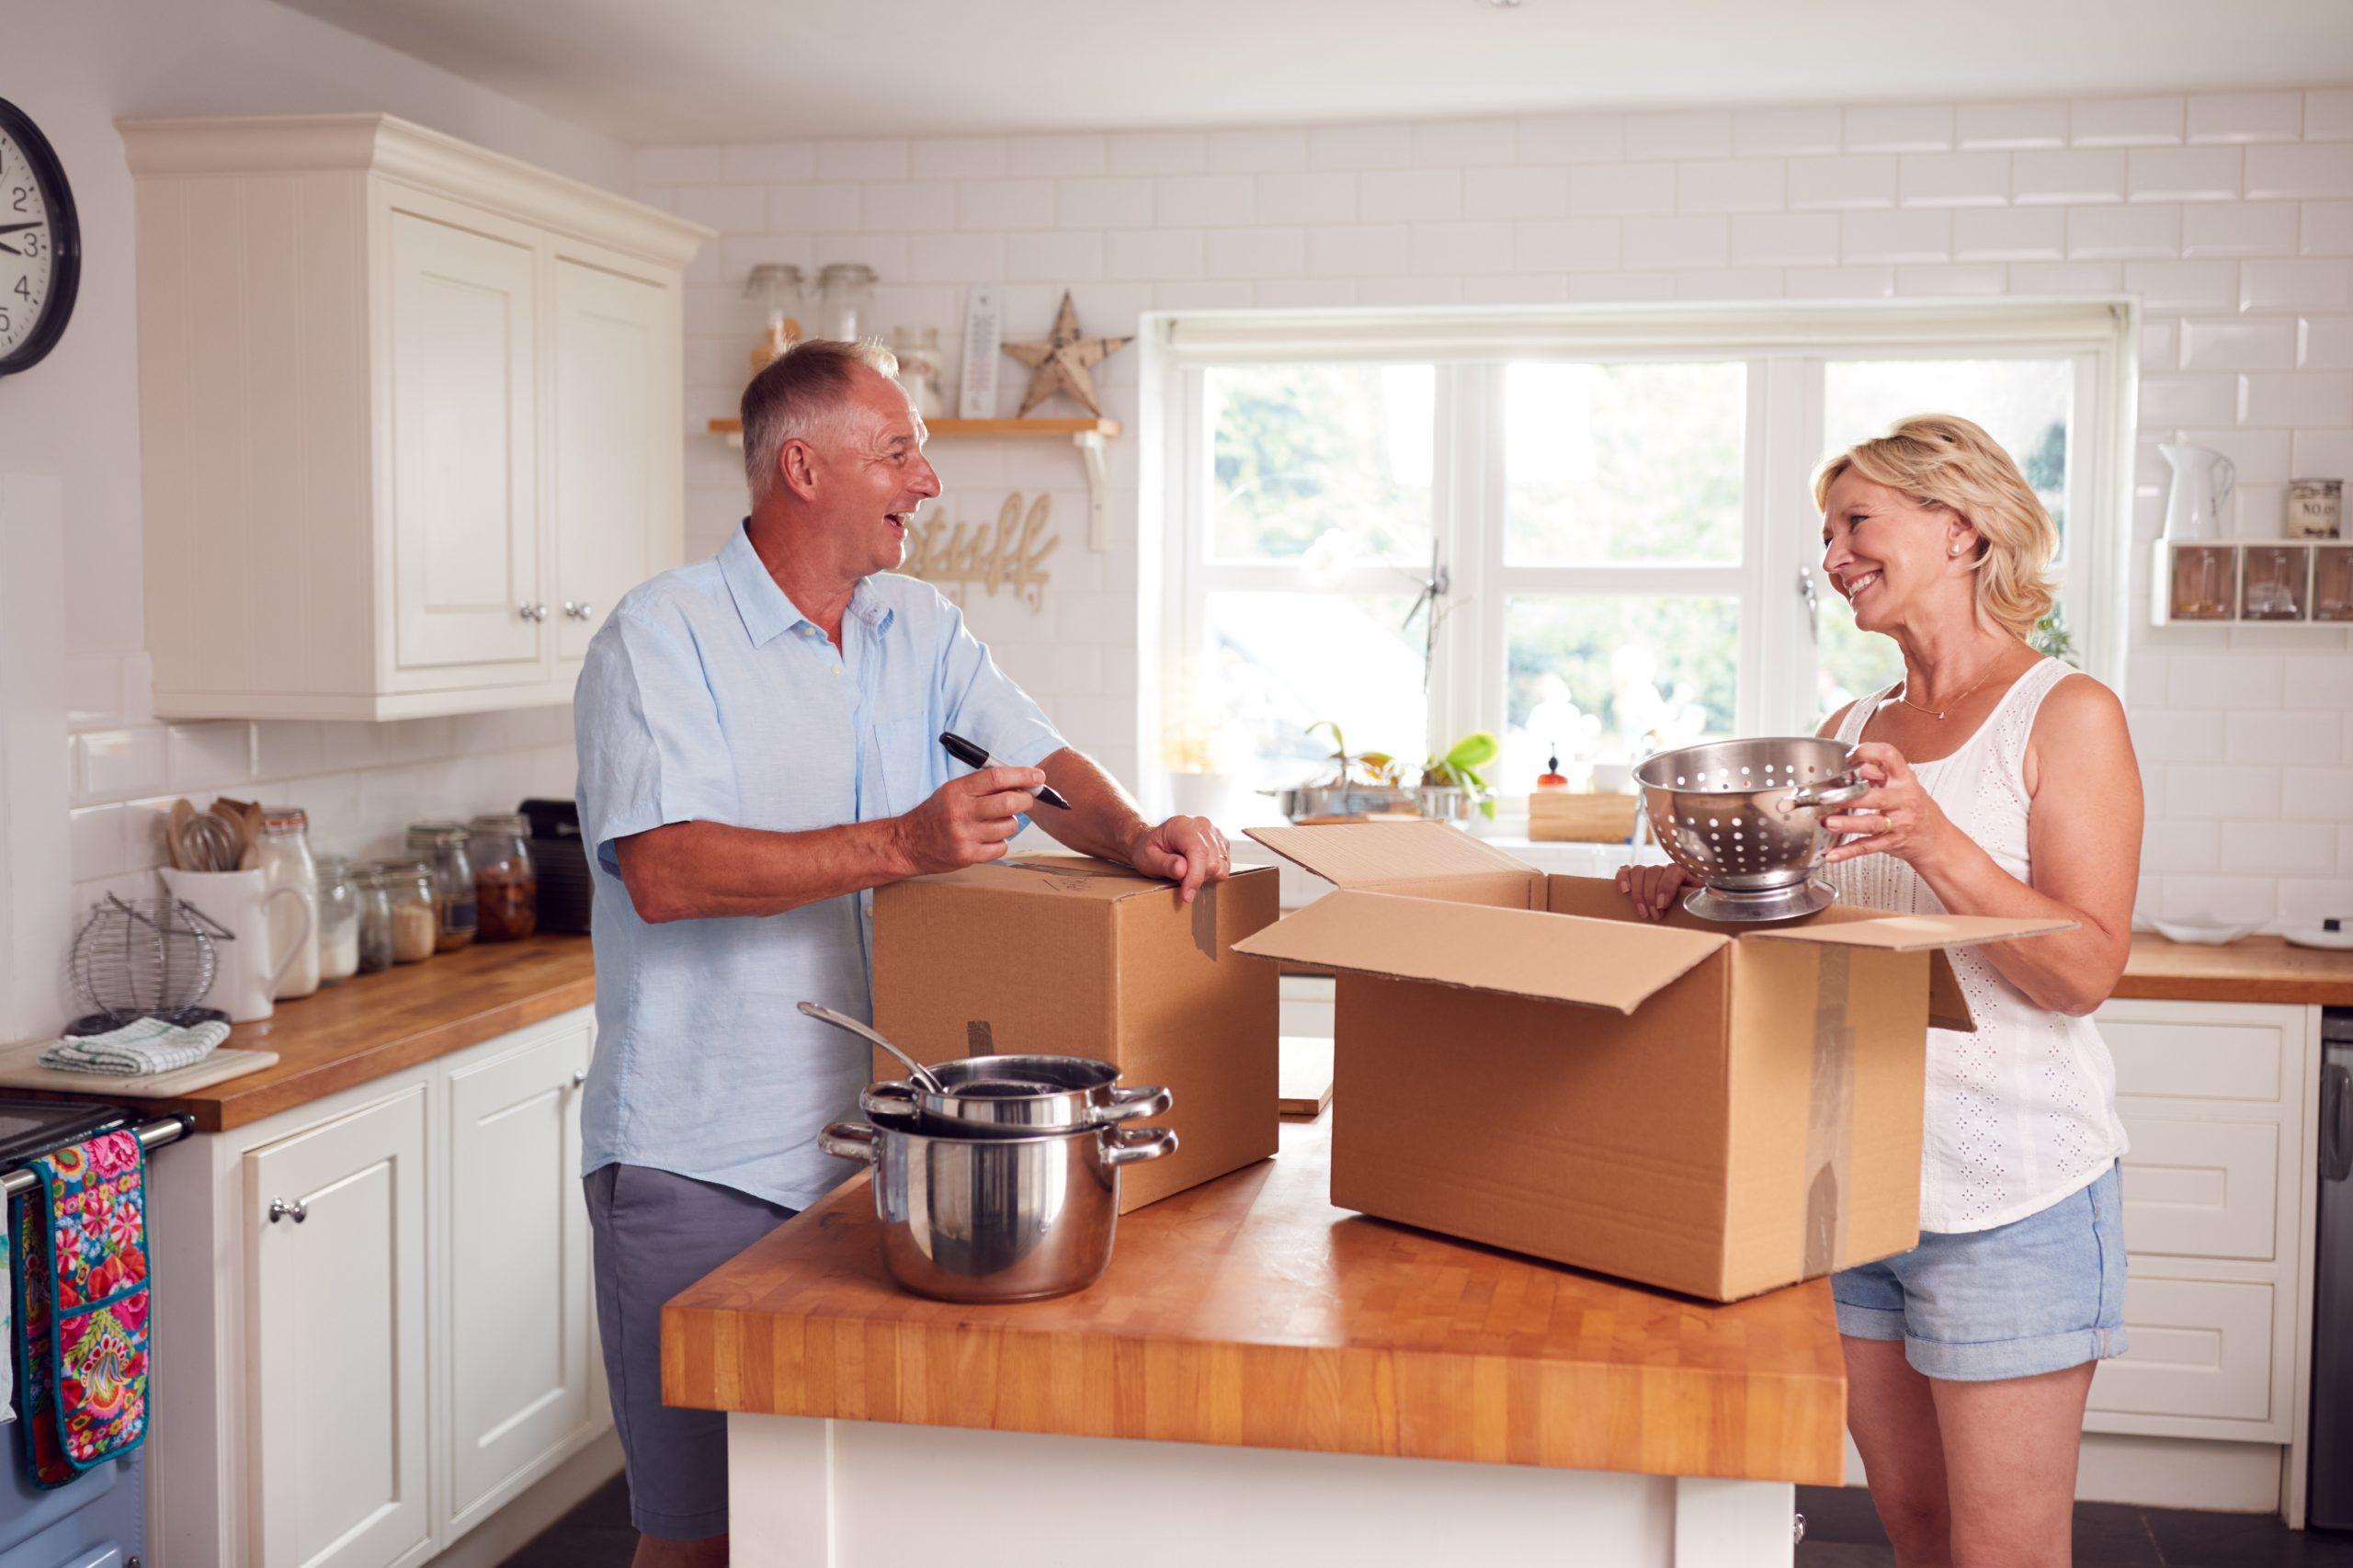 Kitchen Craftsmen renovation prepare home resale value